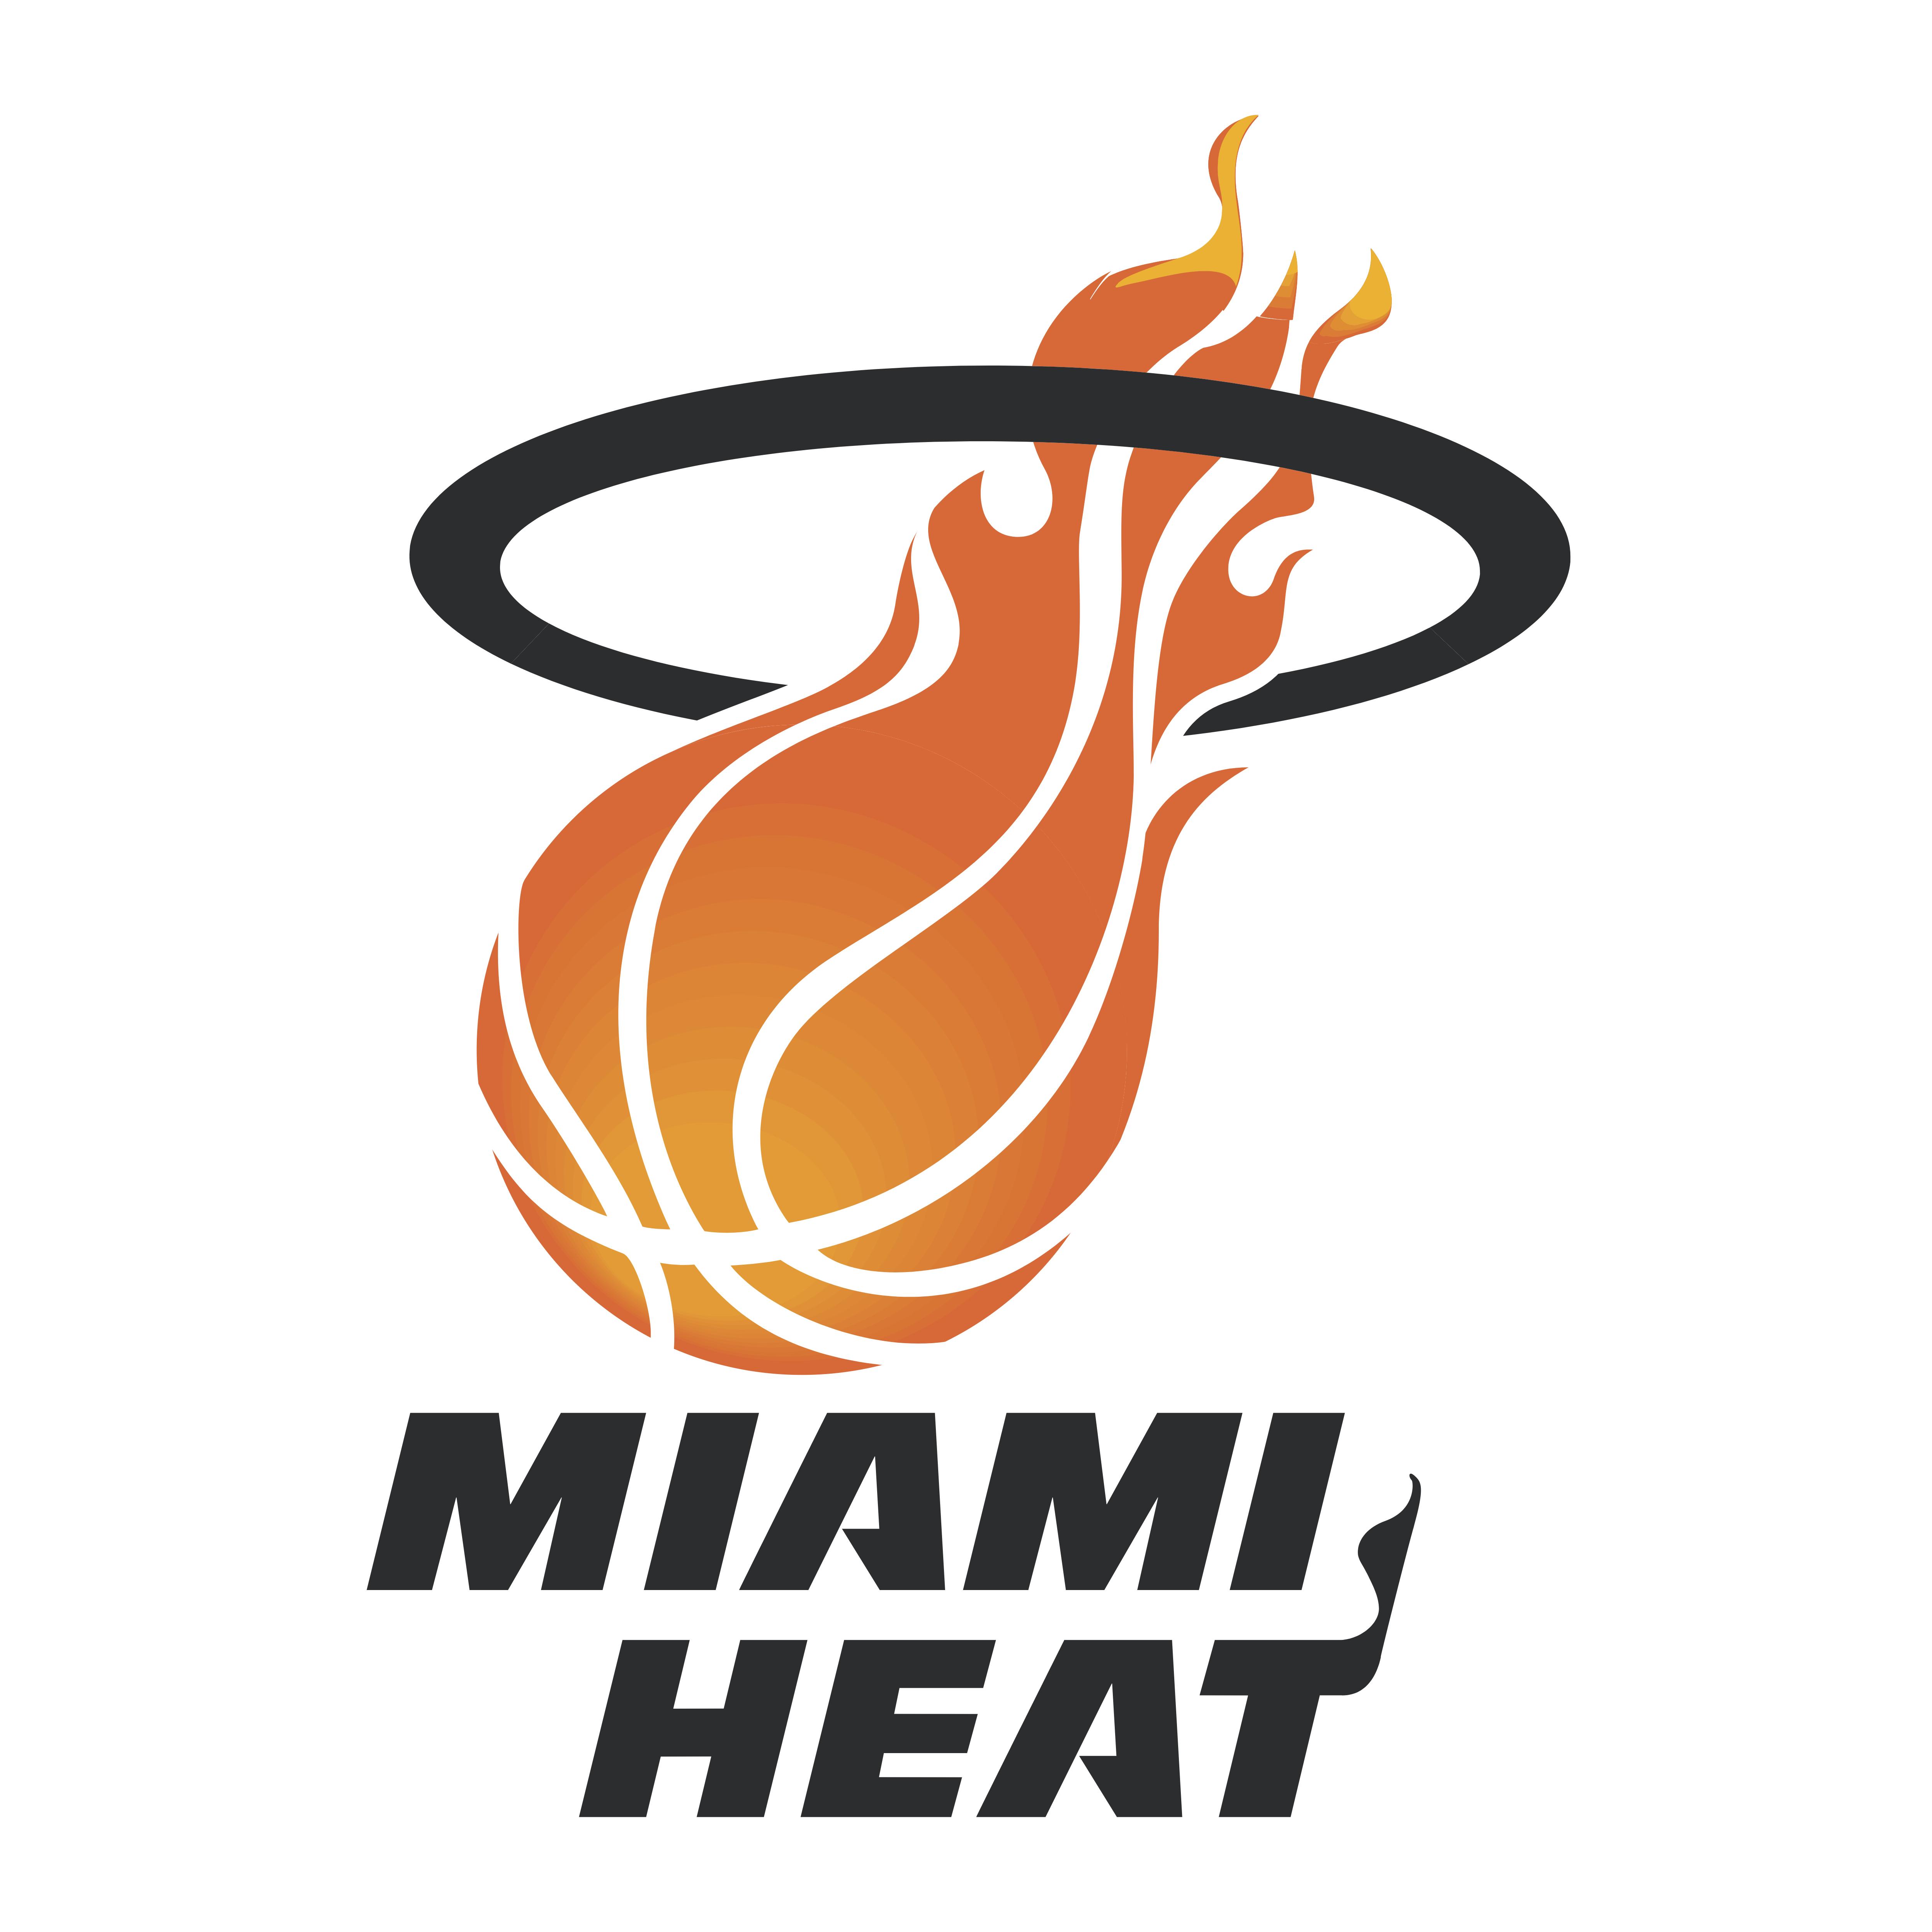 miami heat logos download rh logos download com heart logos hat logos design